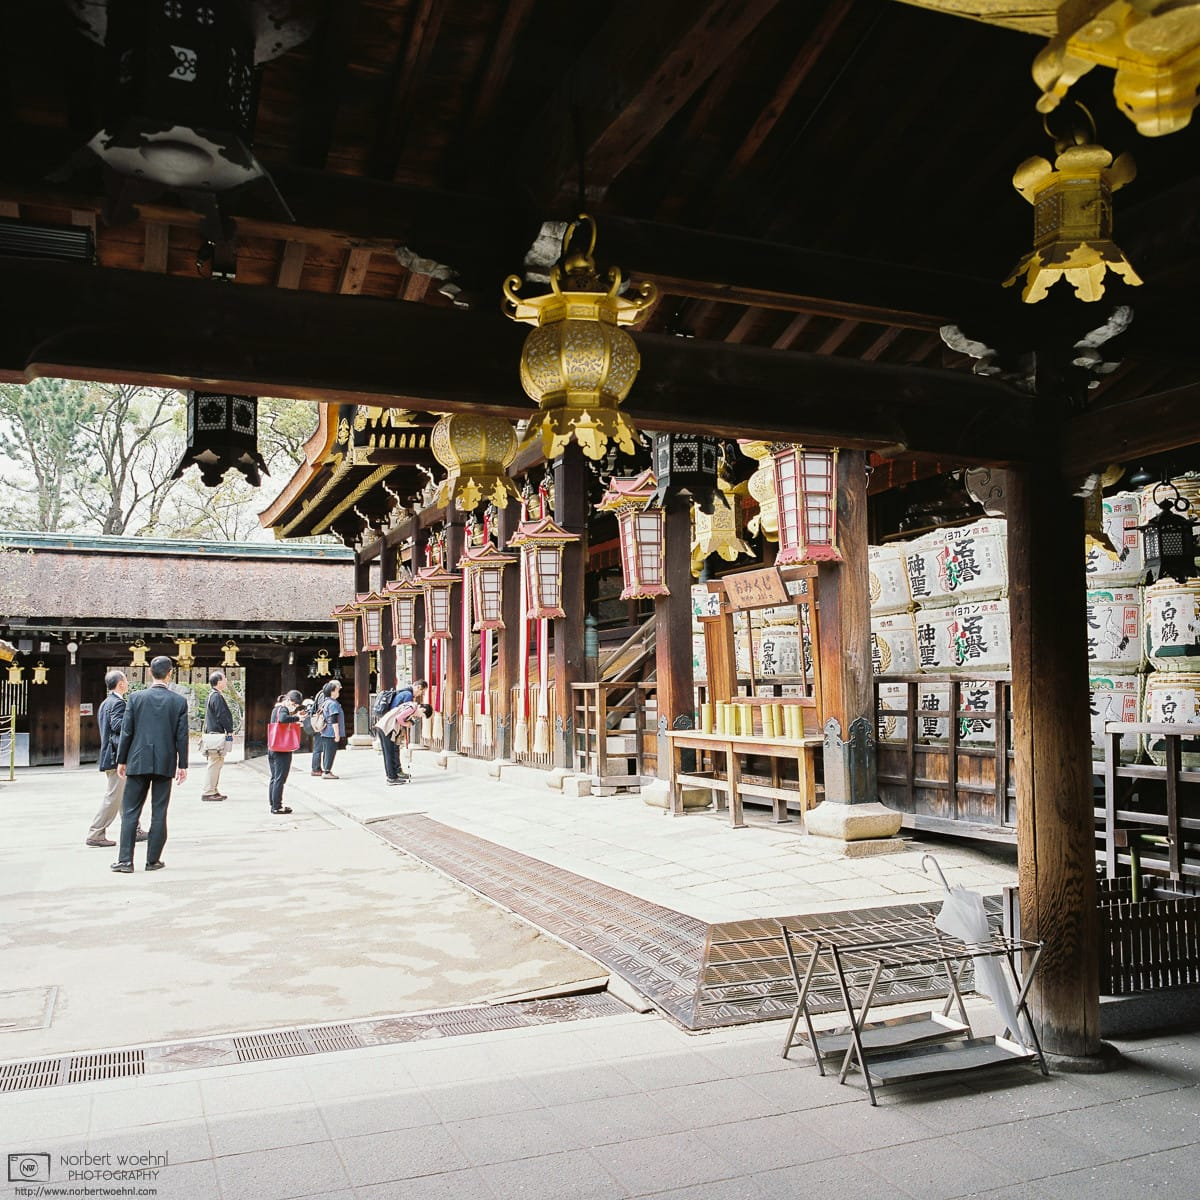 Visitors arriving for prayer, Kitano Tenmangu, Kyoto, Japan Photo